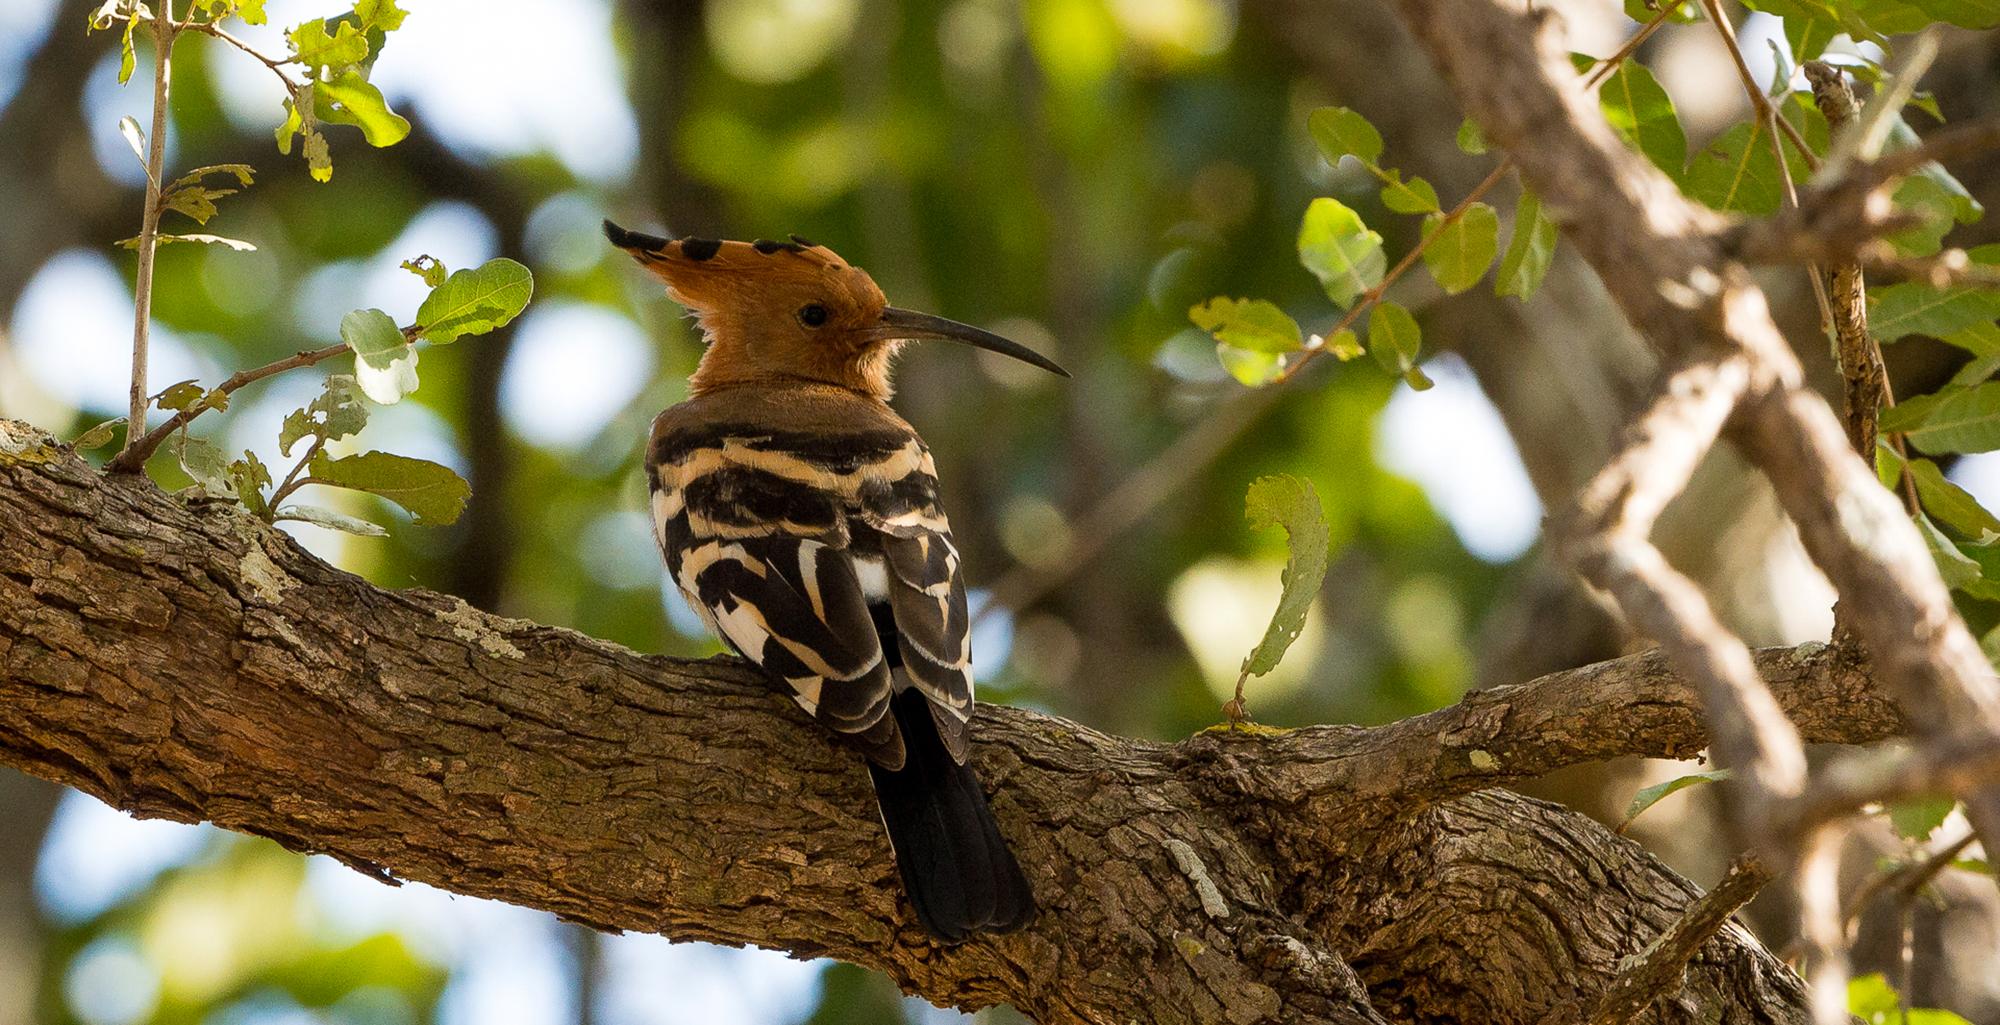 Malawi-Majete-Wildlife-Reserve-Bird